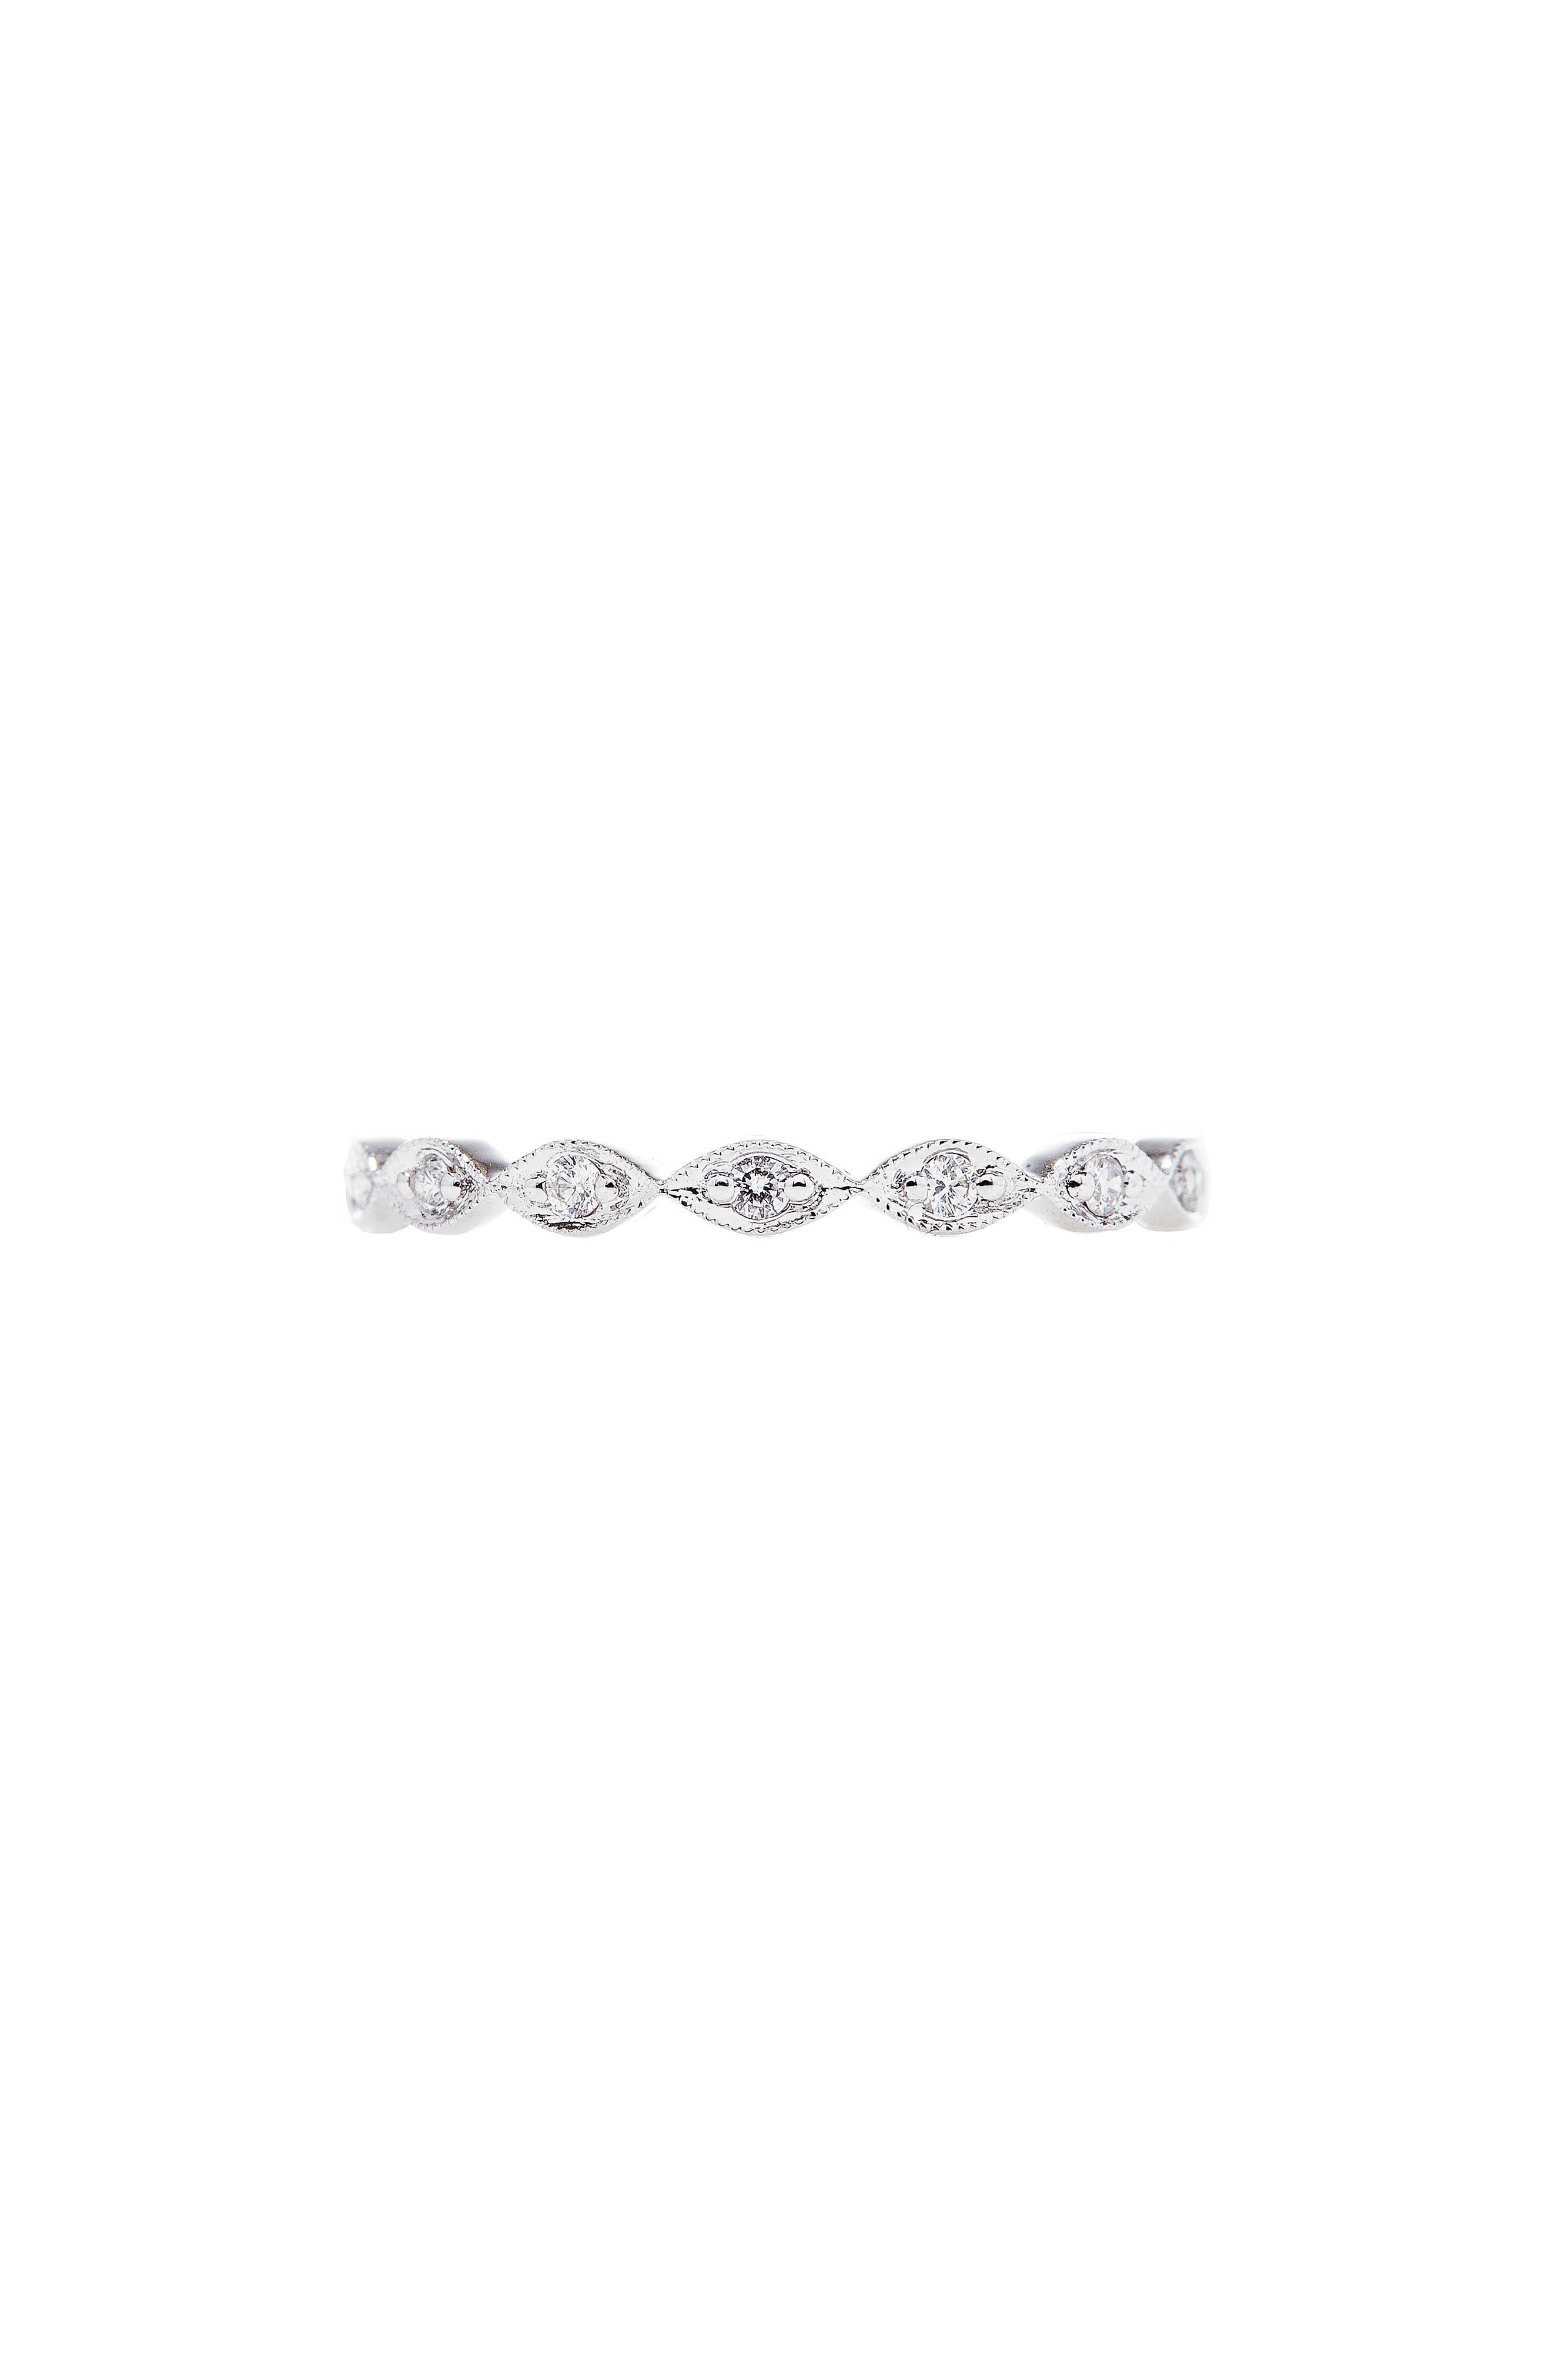 SETHI COUTURE MARQUIS CUT DIAMOND RING